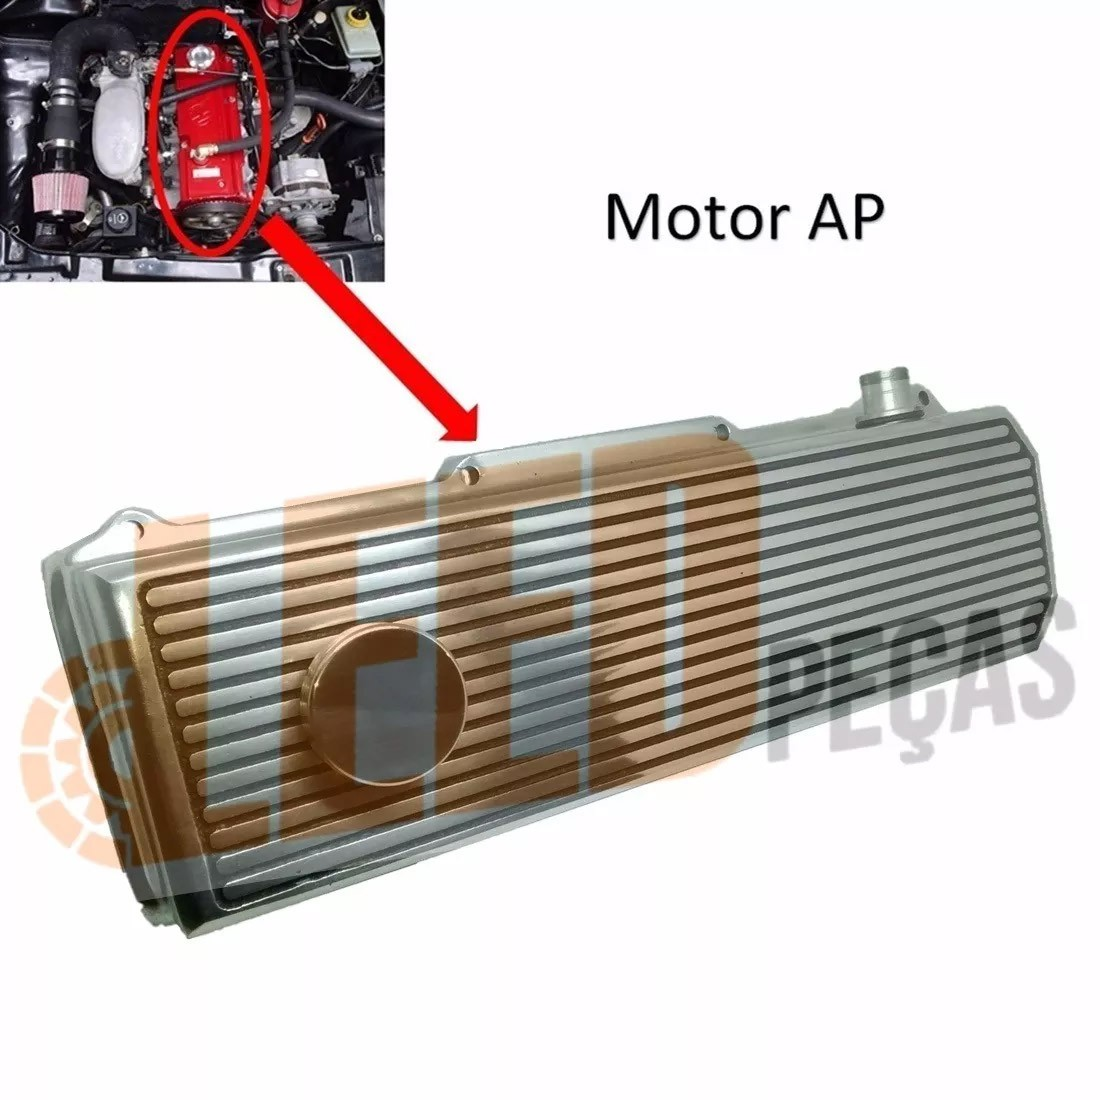 TAMPA COMANDO DE VALVULA (PRETA POLIDA) MOTOR AP VW 1.6 1.8 2.0 8V